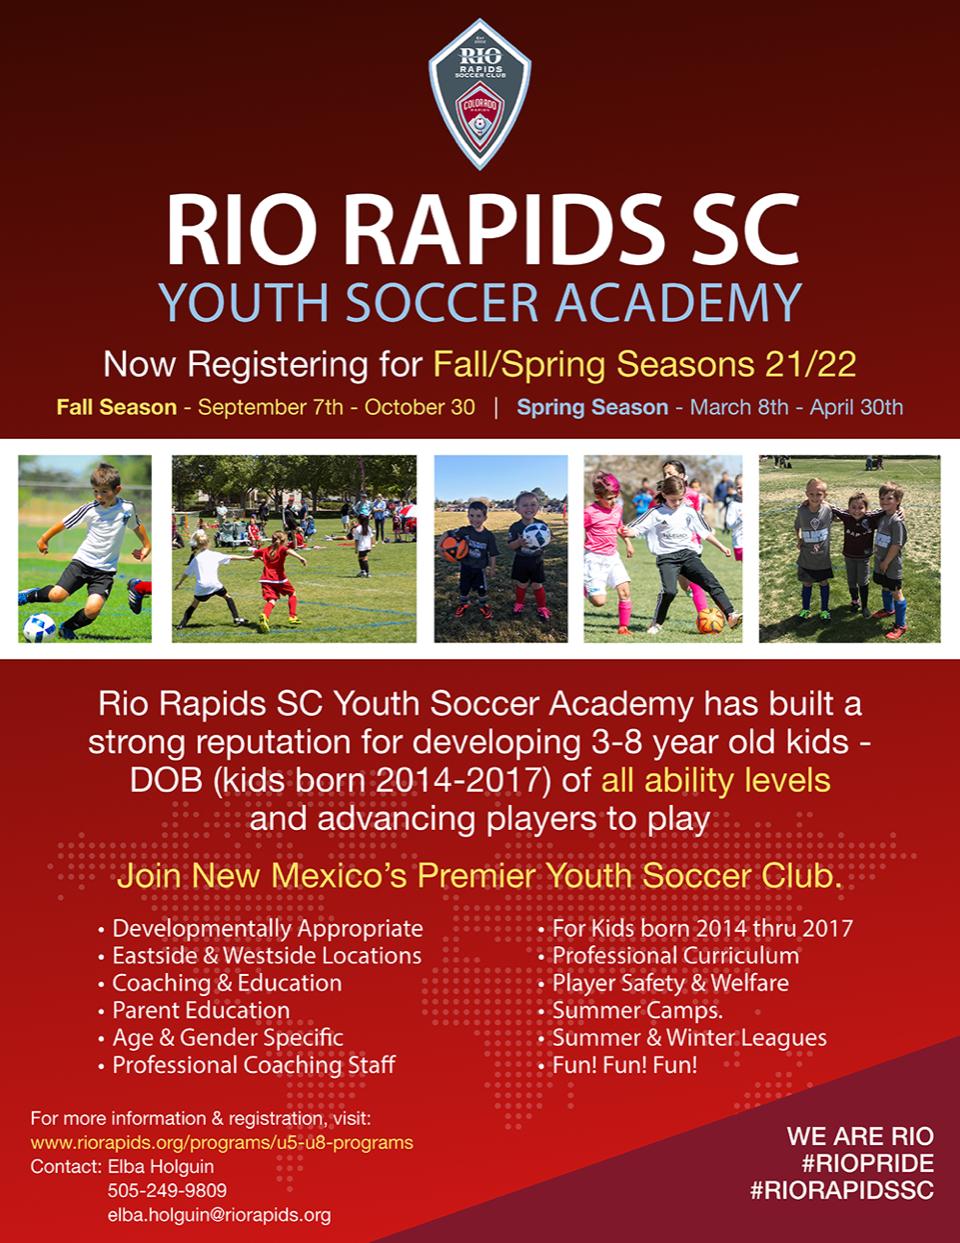 Rrsc youth academy flyer 080521